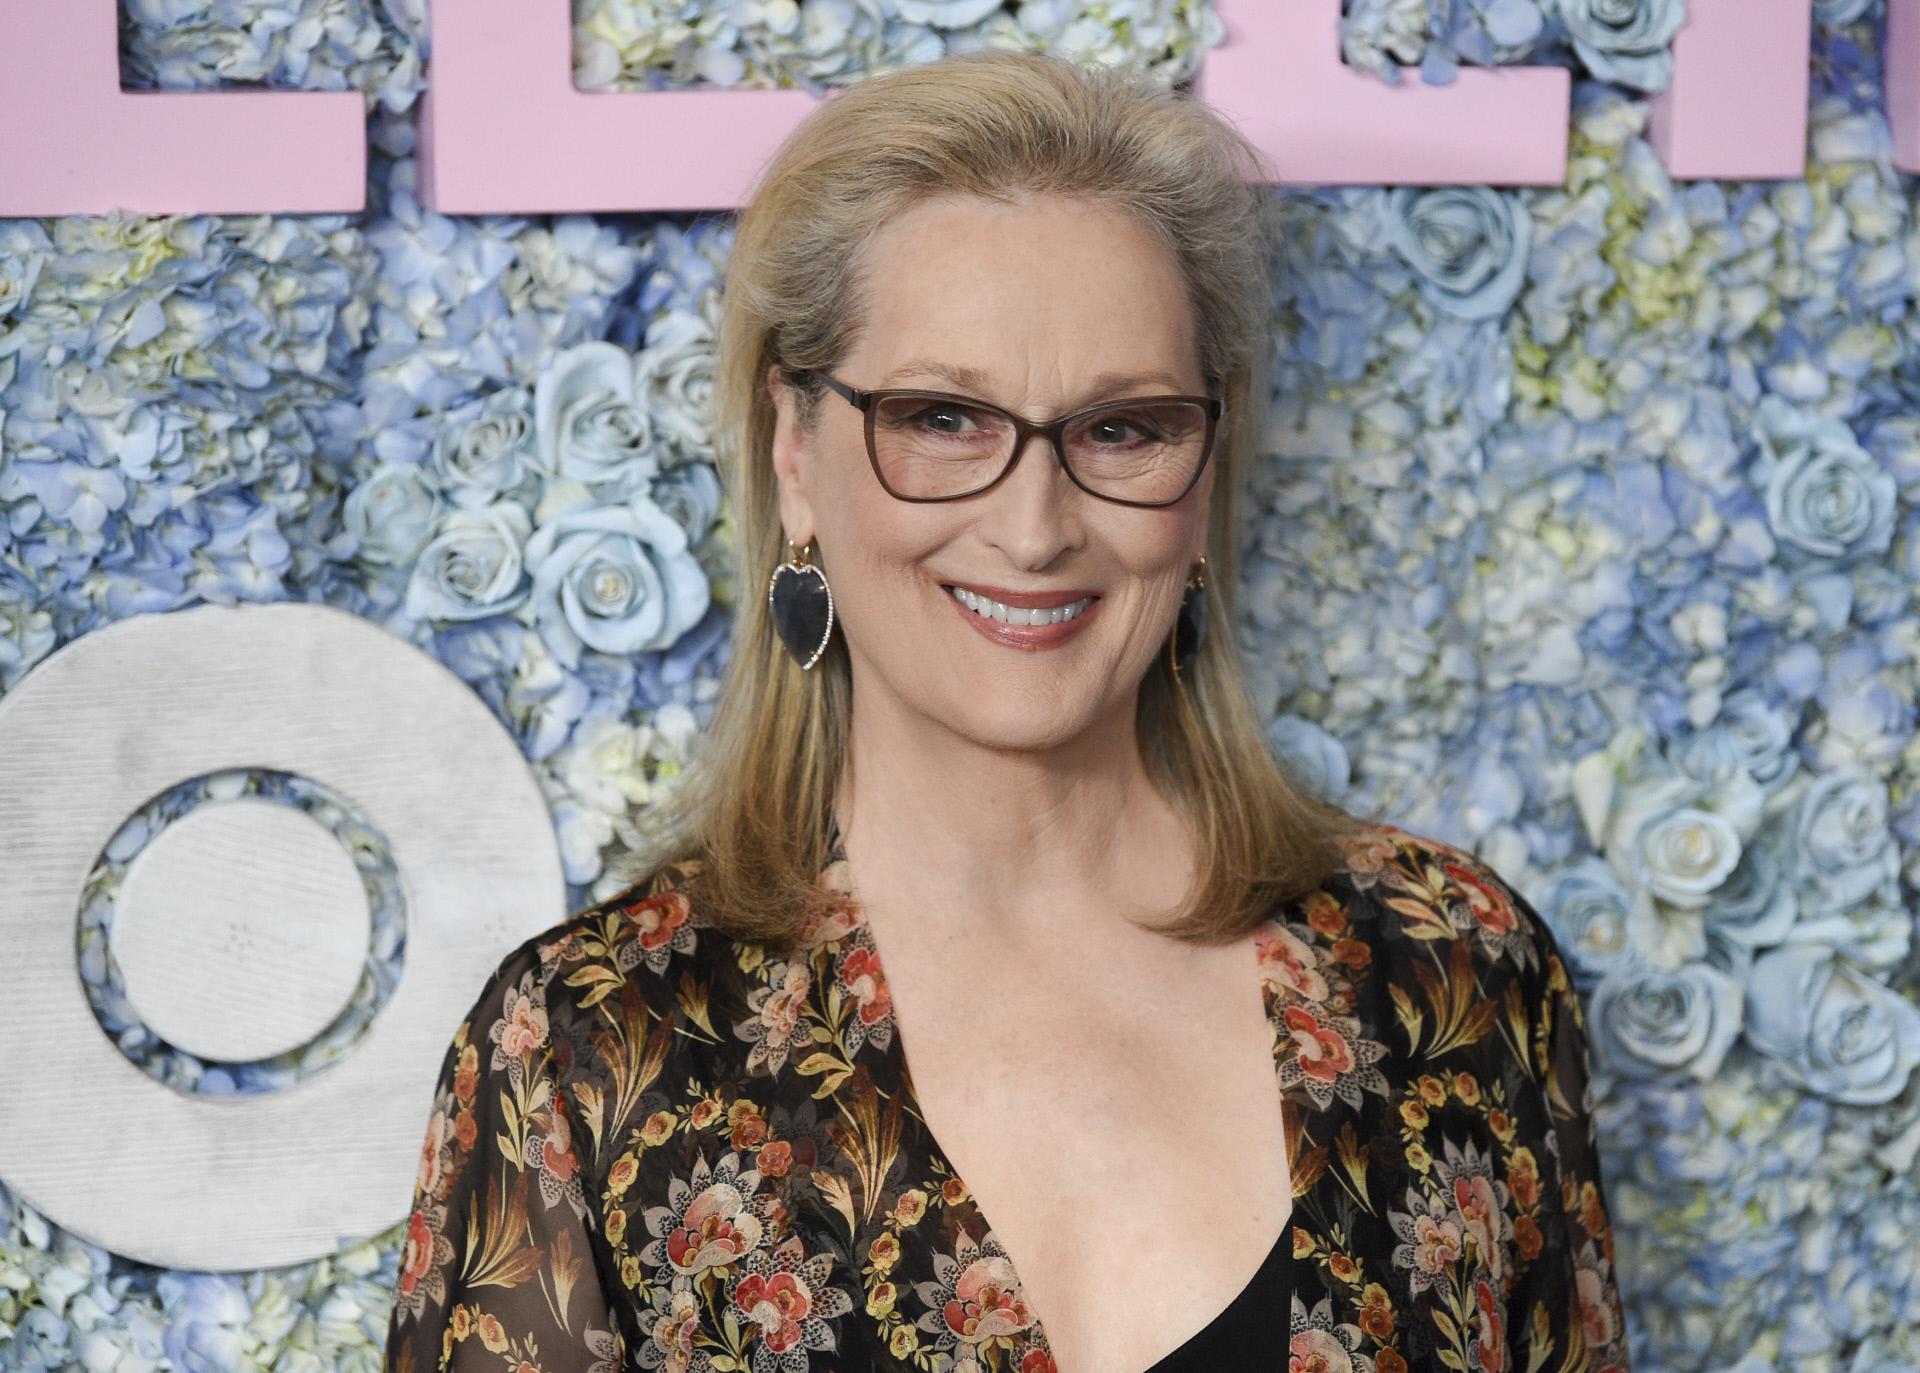 Meryl Streep elige un long bob liso que a veces realza con unas ondas suaves para lucir sus canas matizadas con su rubio ceniza.